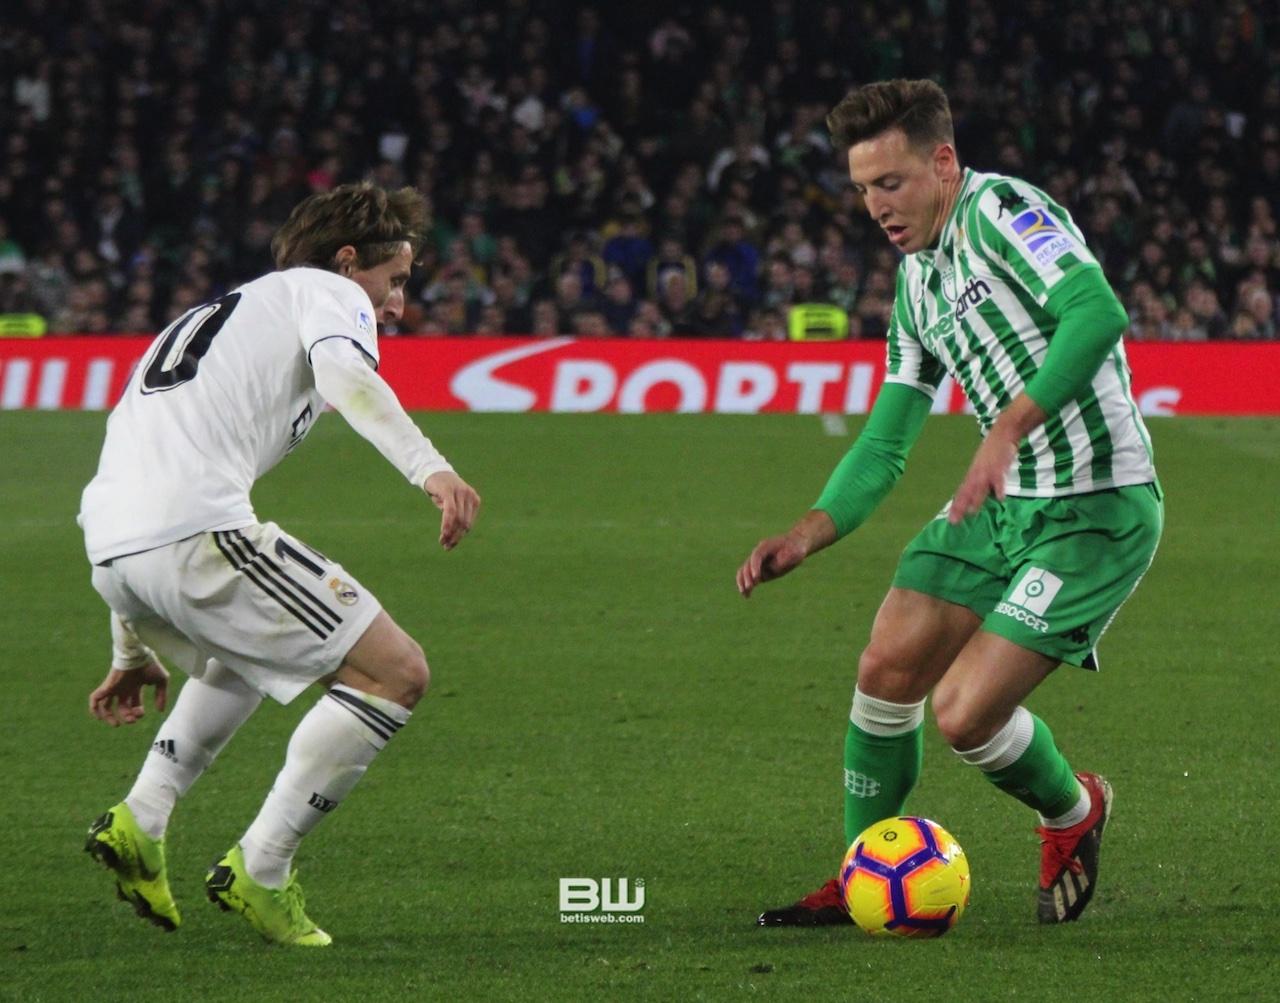 J19 - Betis - Madrid (70)